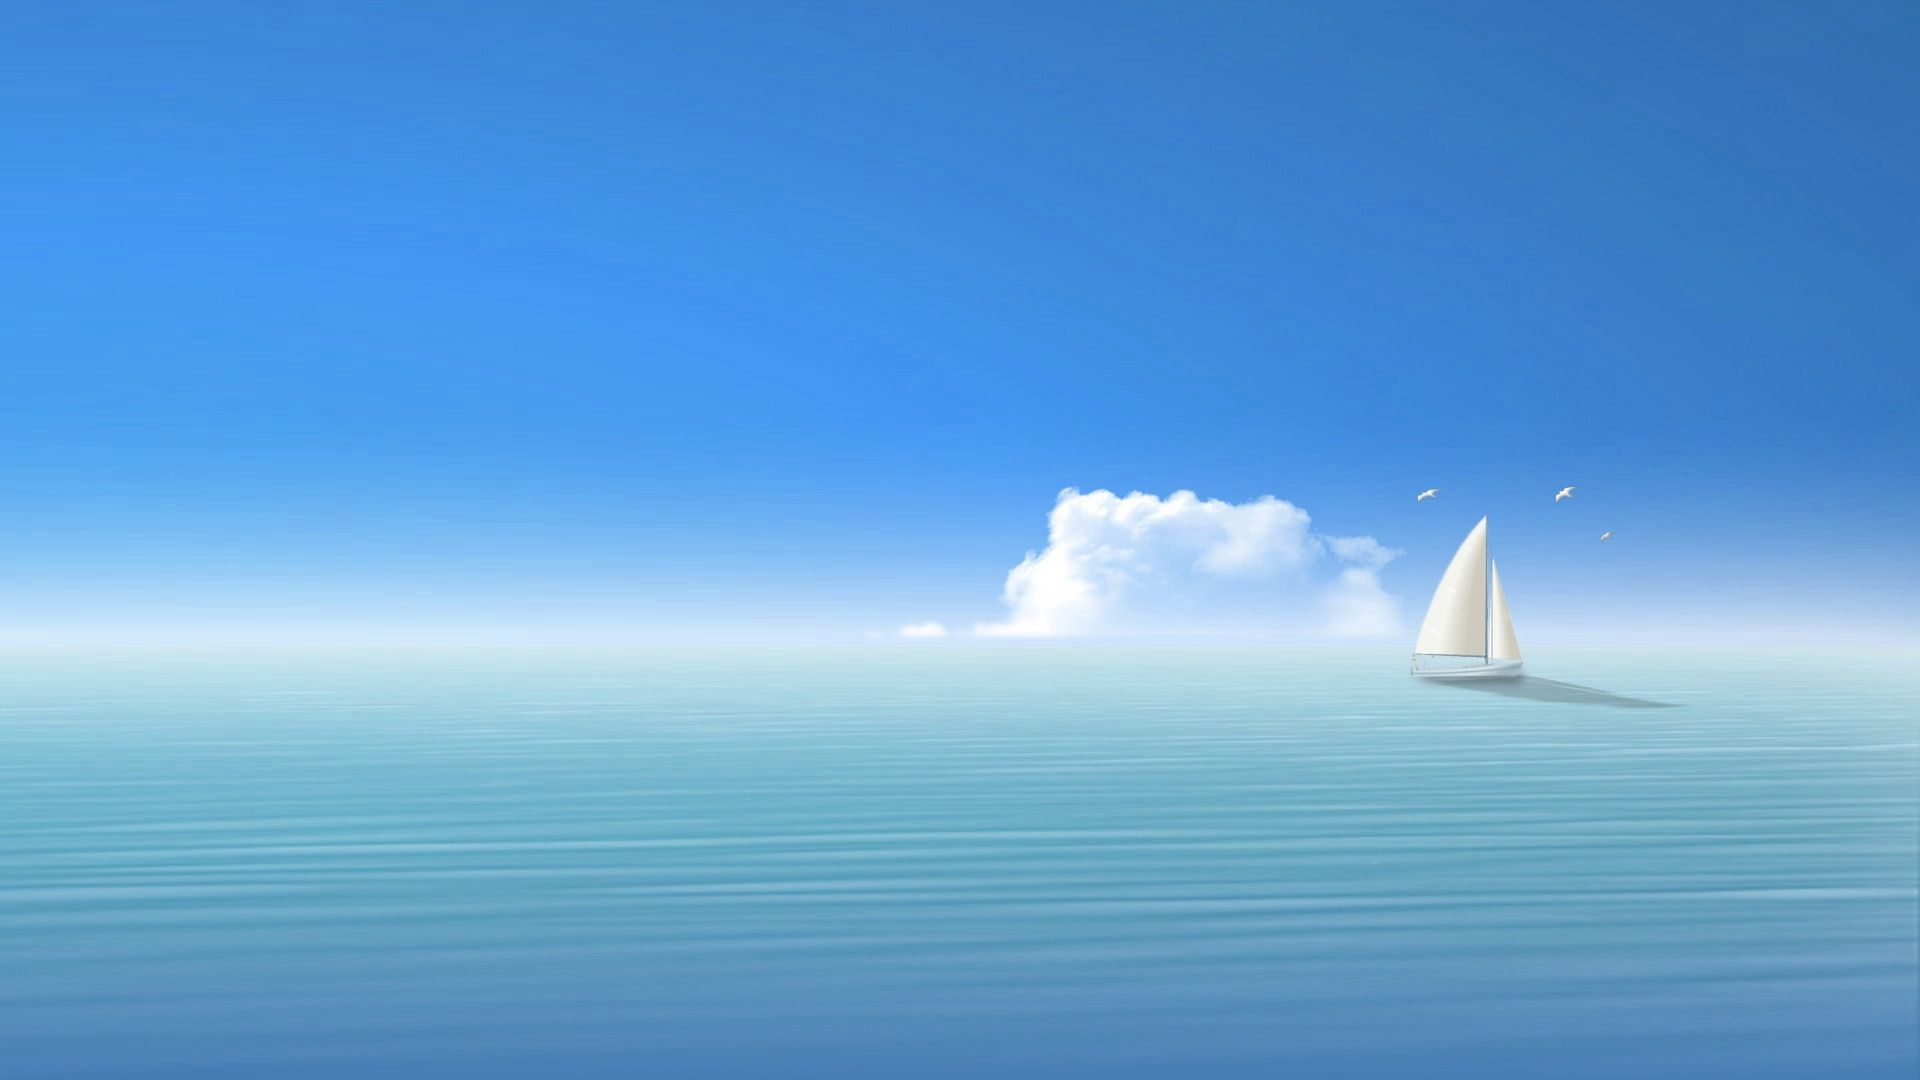 download wallpaper 1920x1080 blue sea ship sky full hd 1080p hd